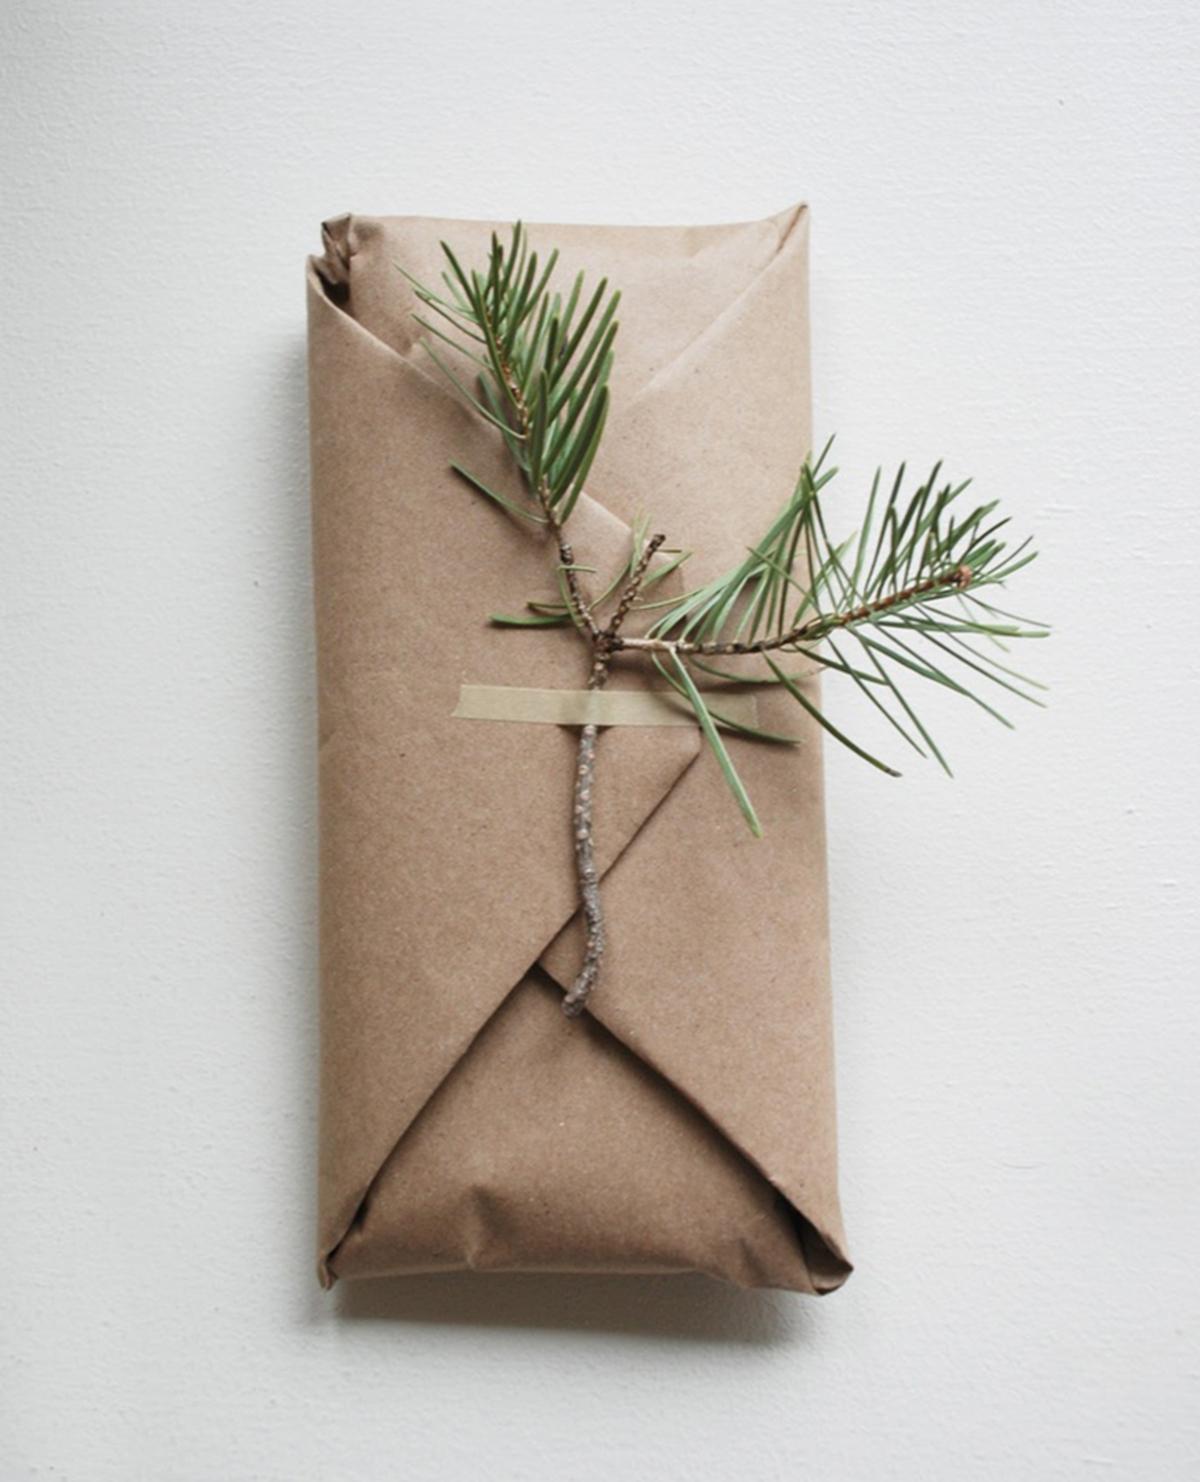 Beau paquet cadeau